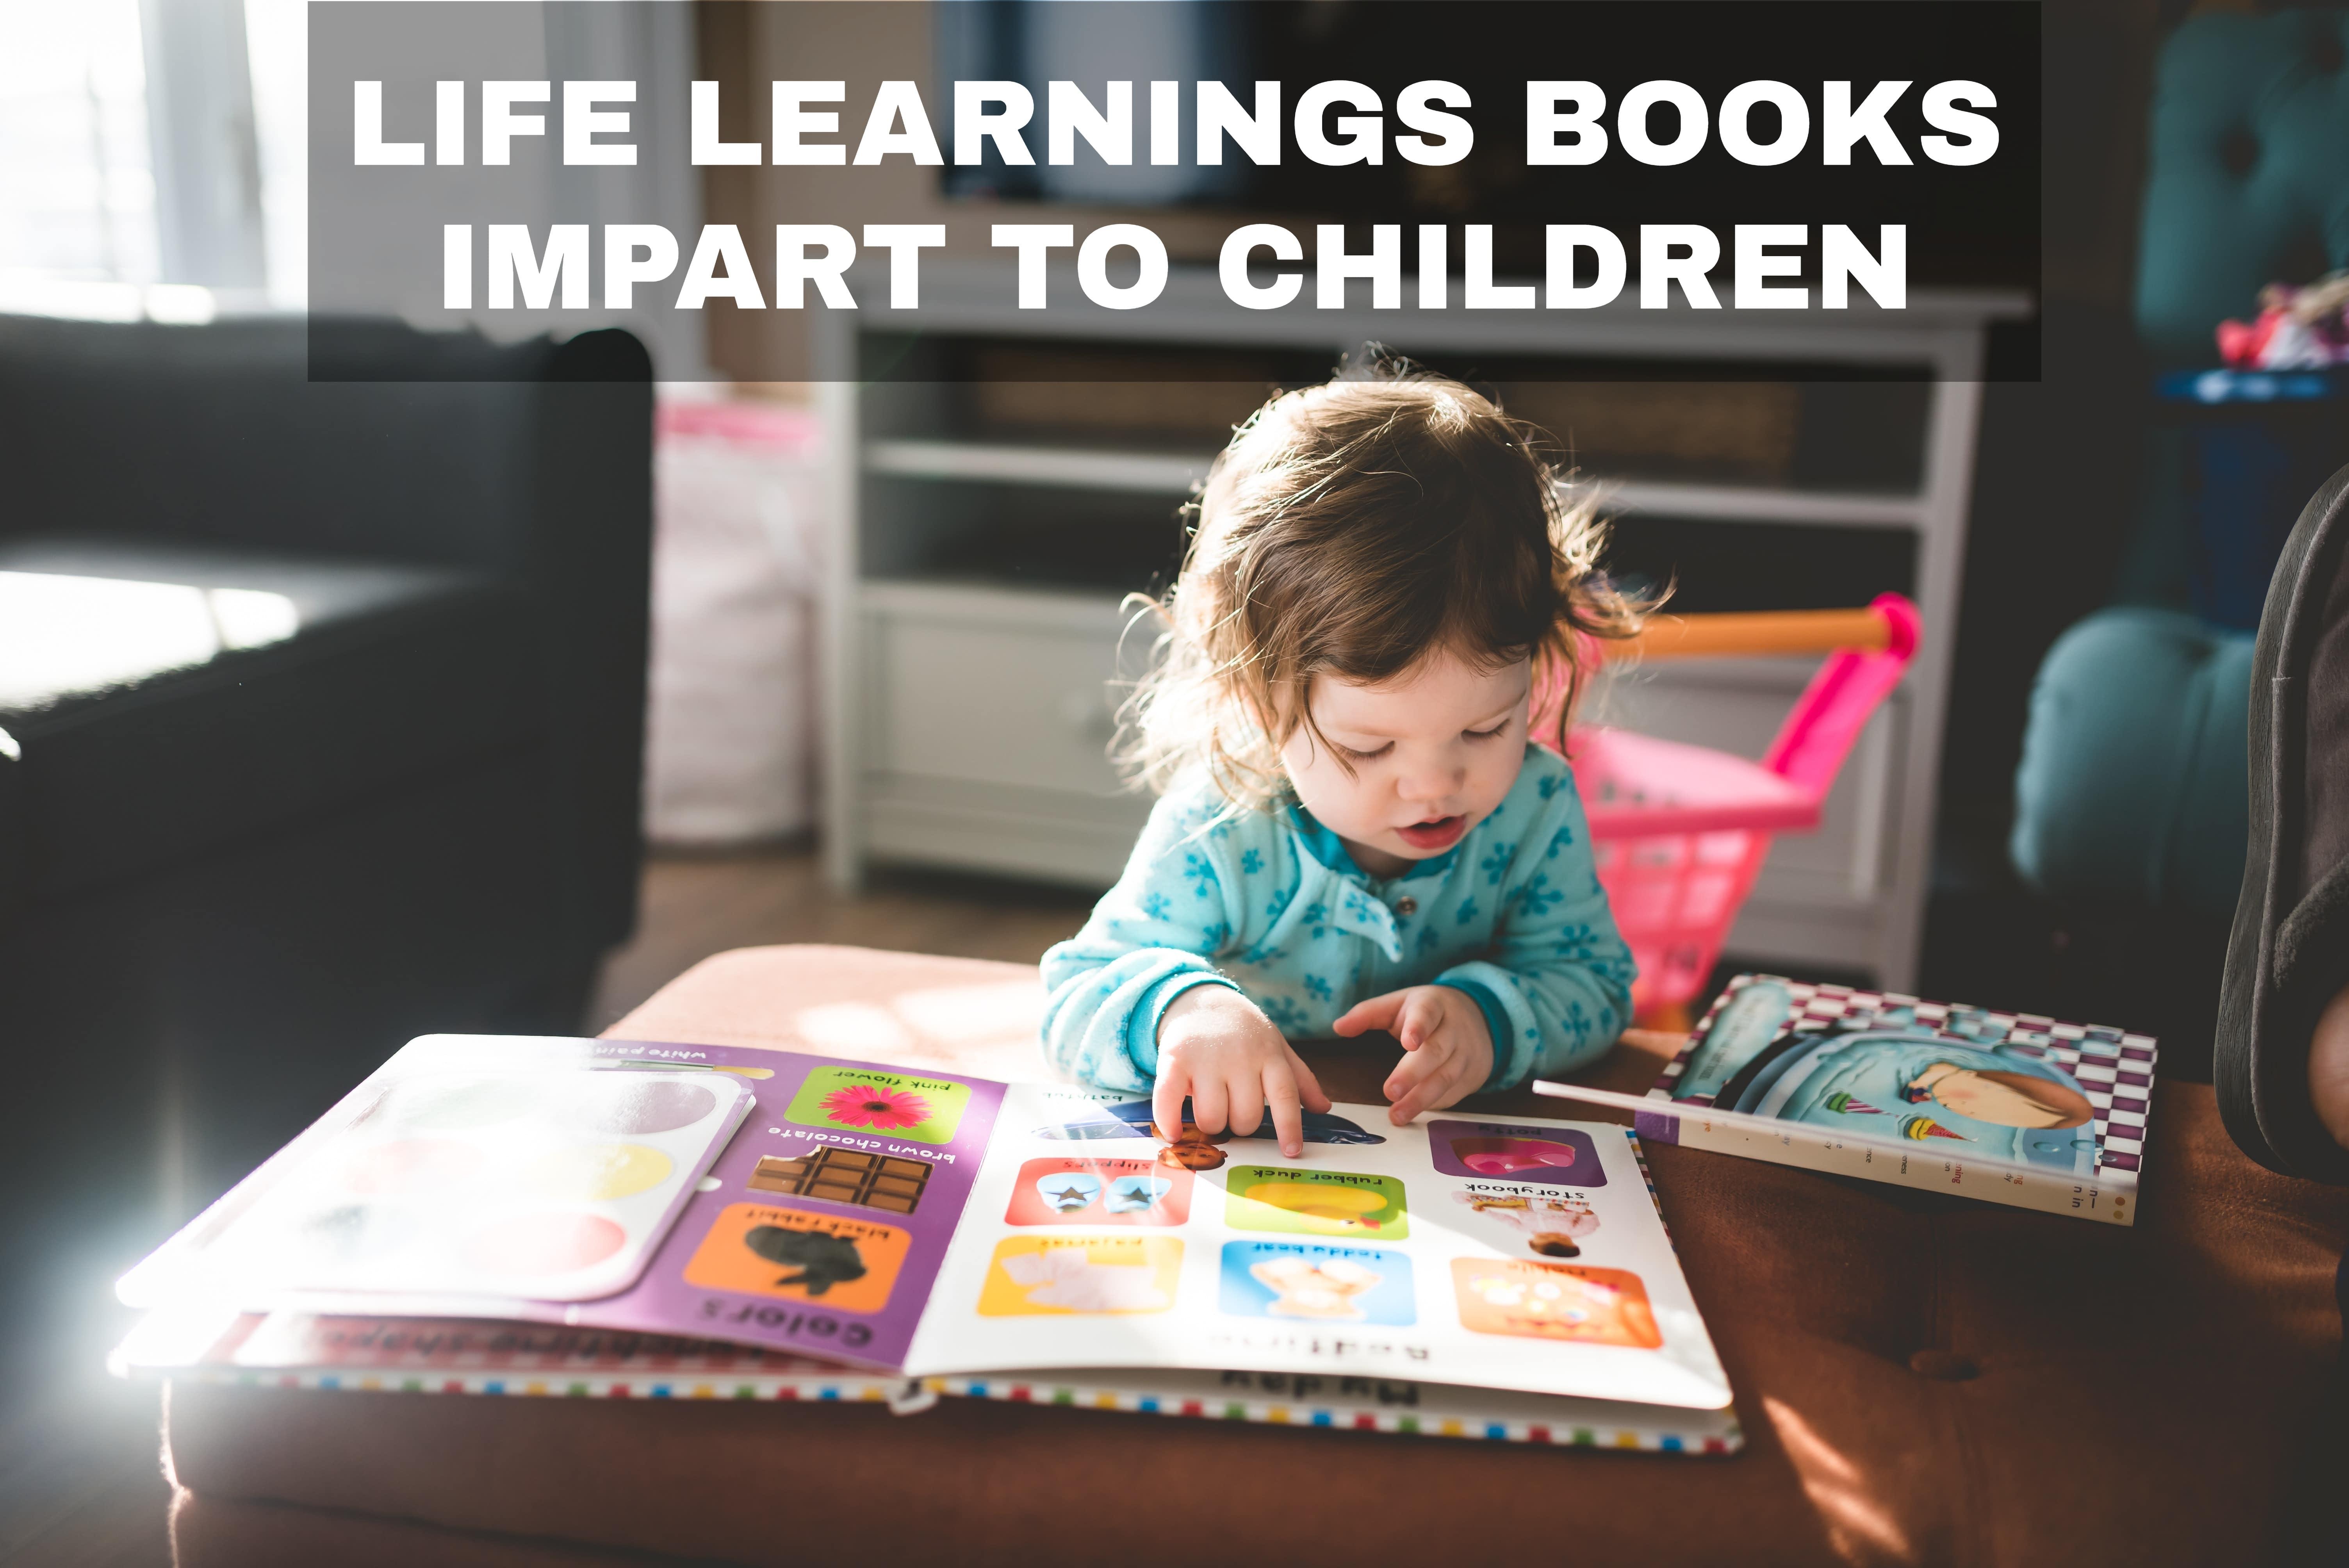 Life Learnings Books Impart to Children